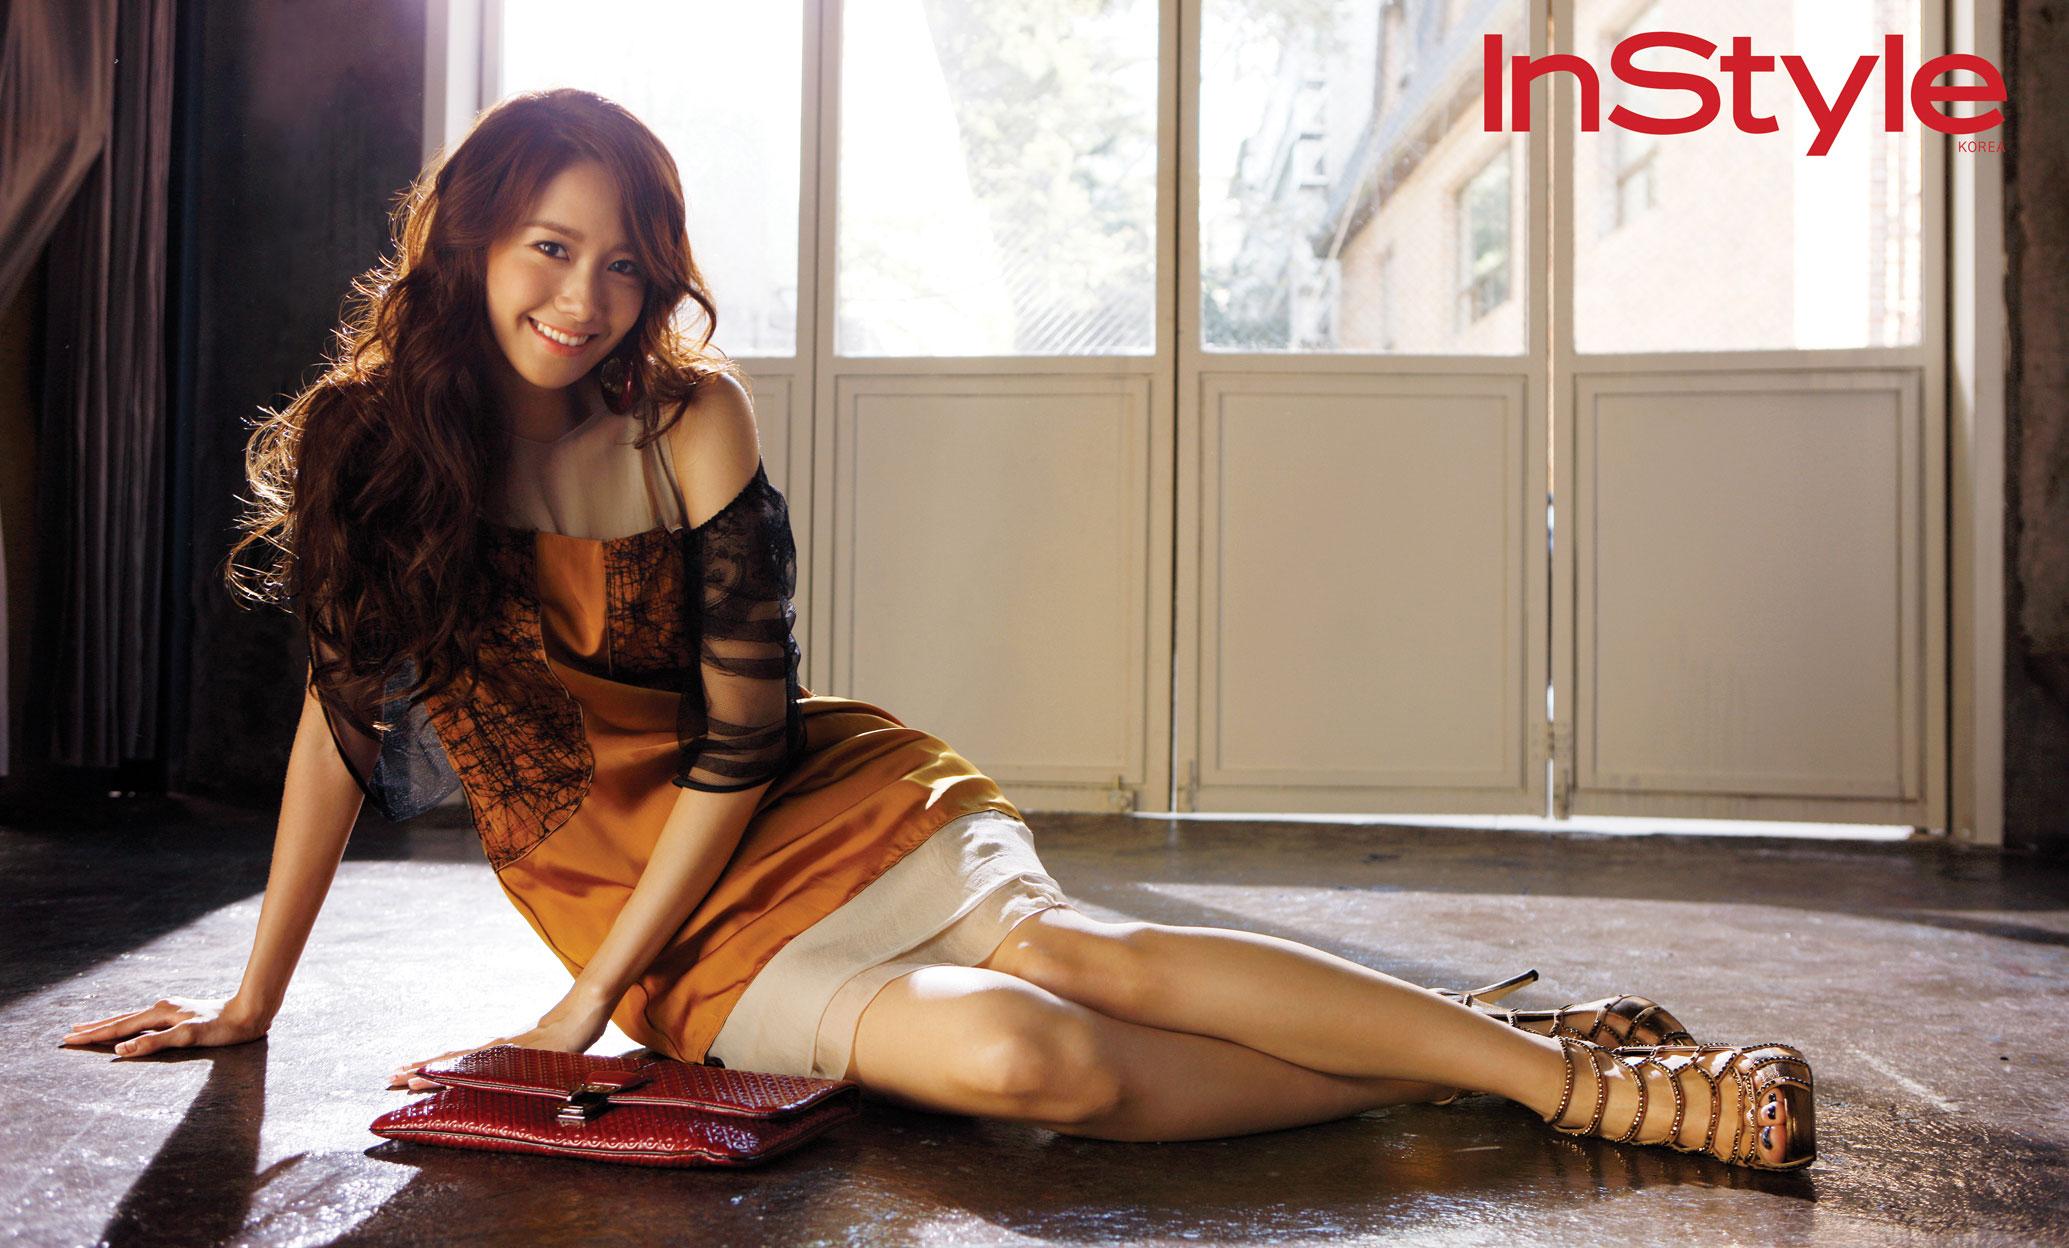 Yoona Instyle Girls 39 Generation Seo Yuyul Photo 28460136 Fanpop